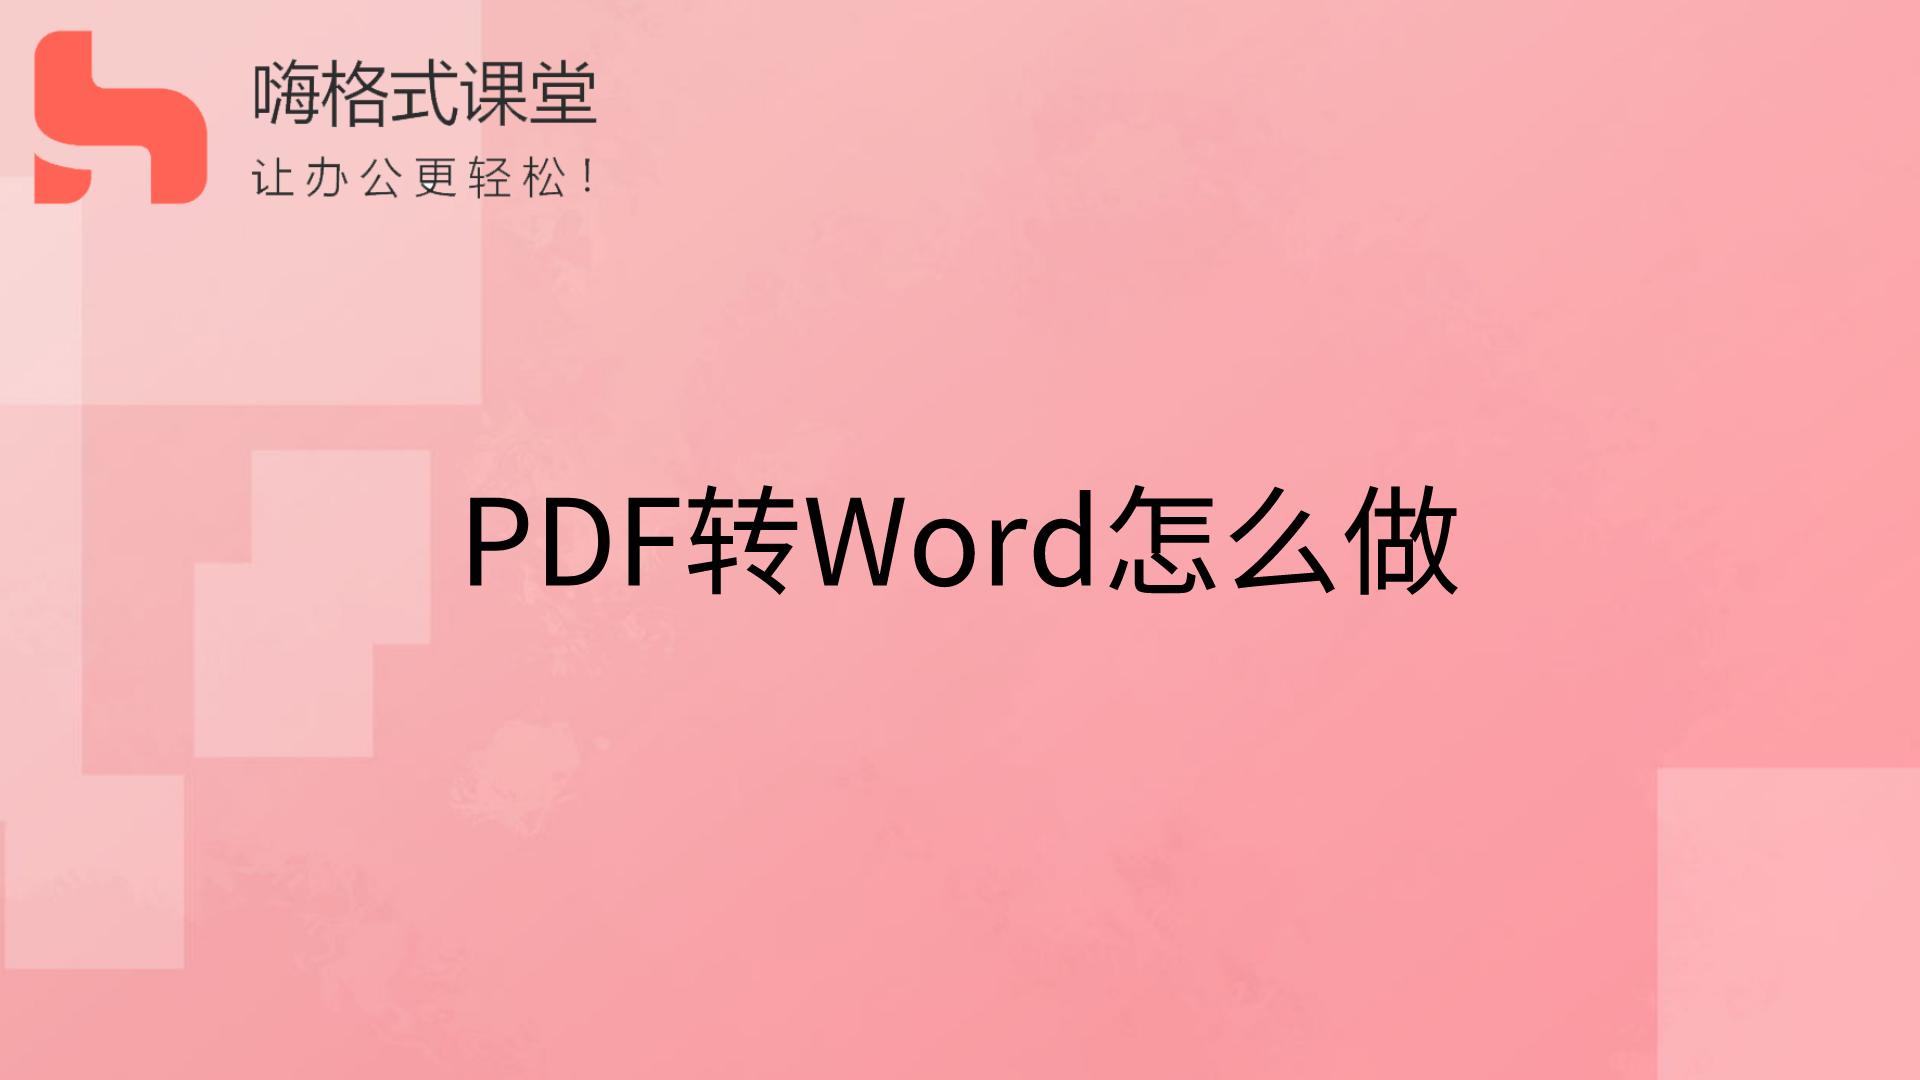 PDF转Word怎么做s